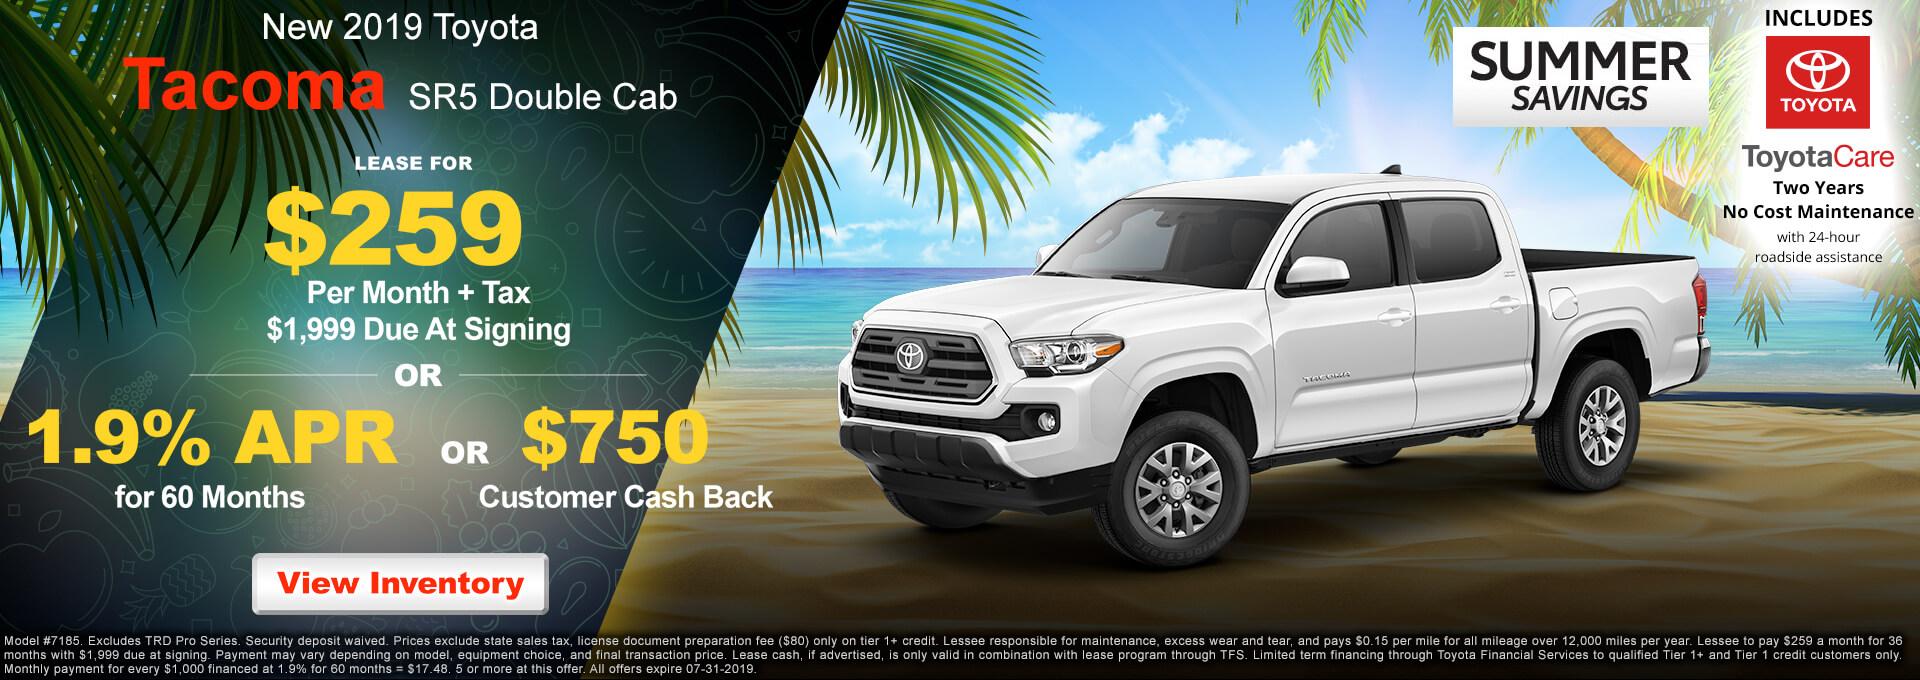 2019 Toyota Tacoma SR5 $259